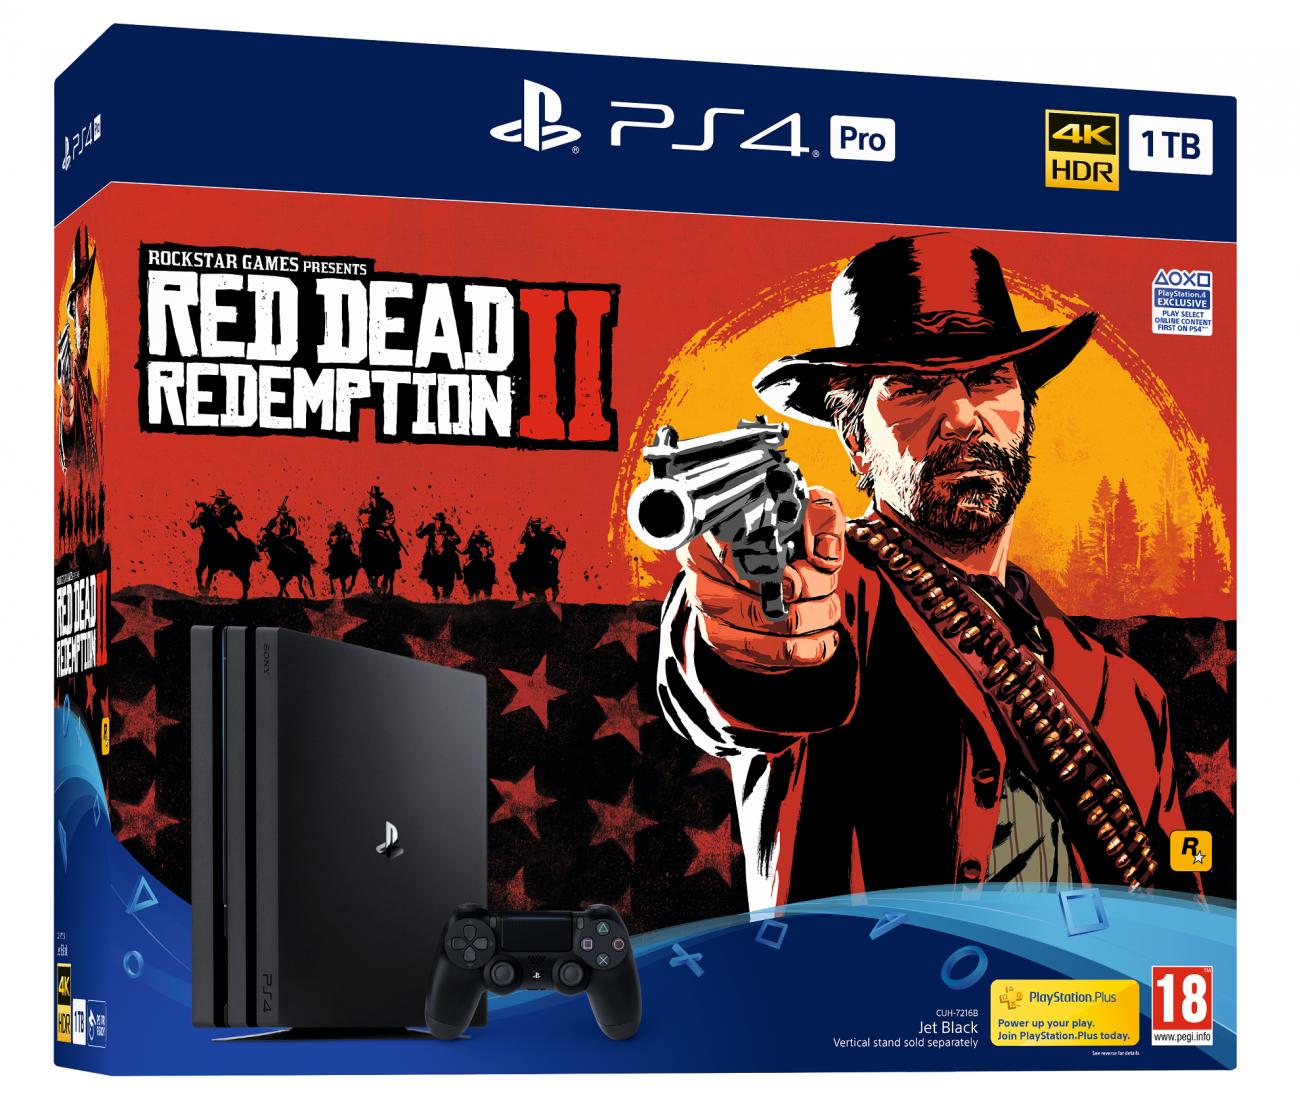 Sony PS4 Slim и PS4 Pro комплект с Red Dead Redemption 2